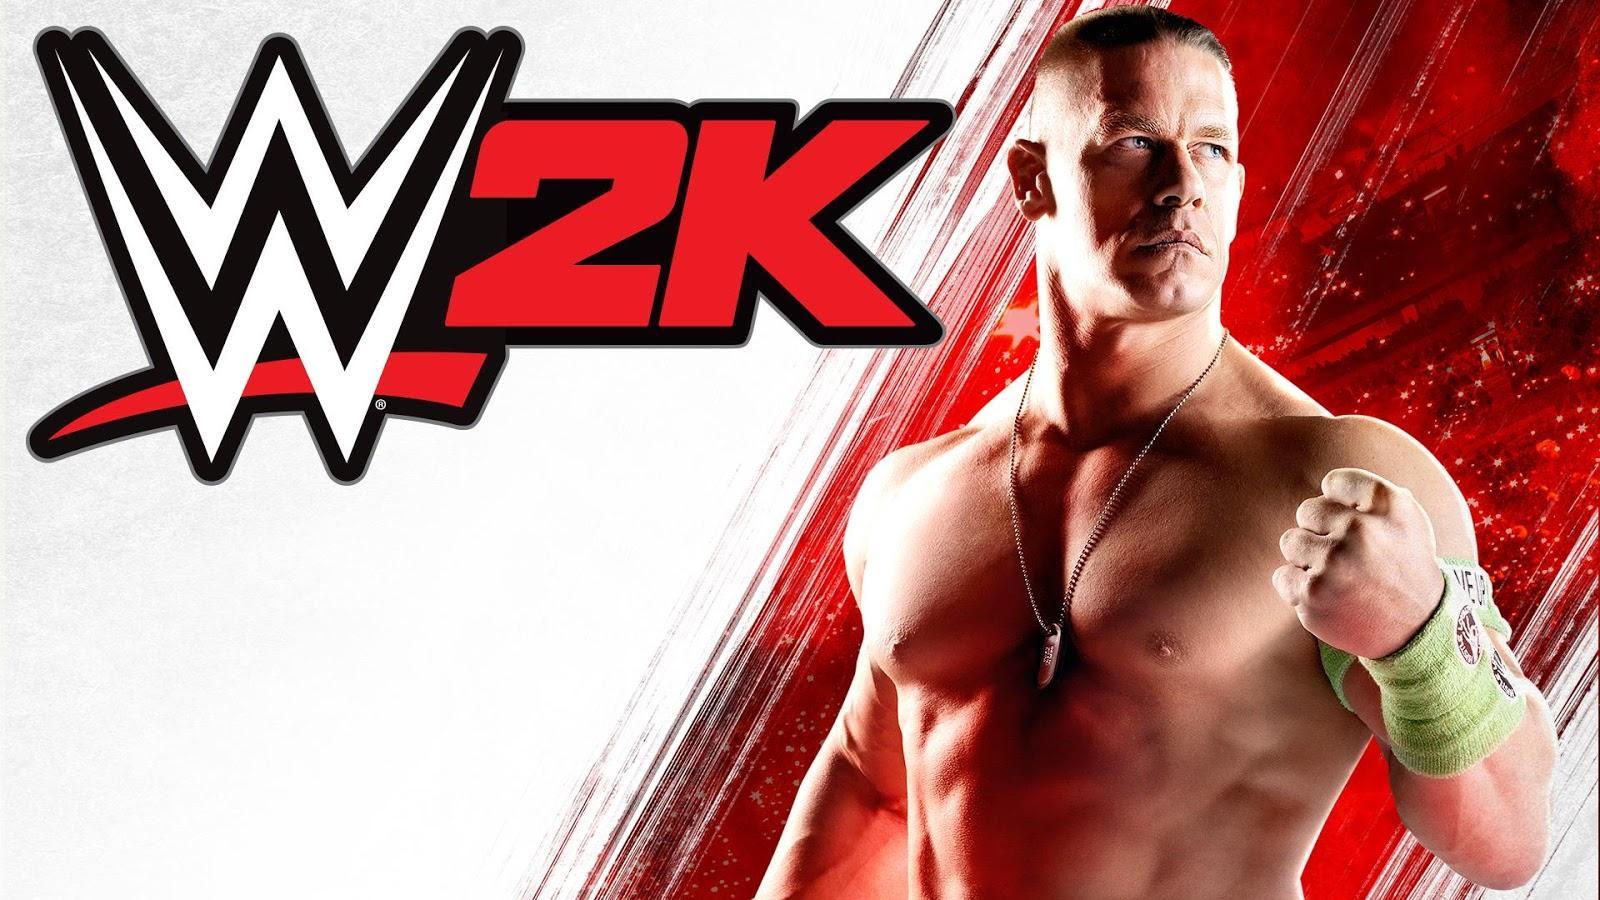 WWE 2K (MOD APK, Paid/Unlocked) v1.1.8117 1